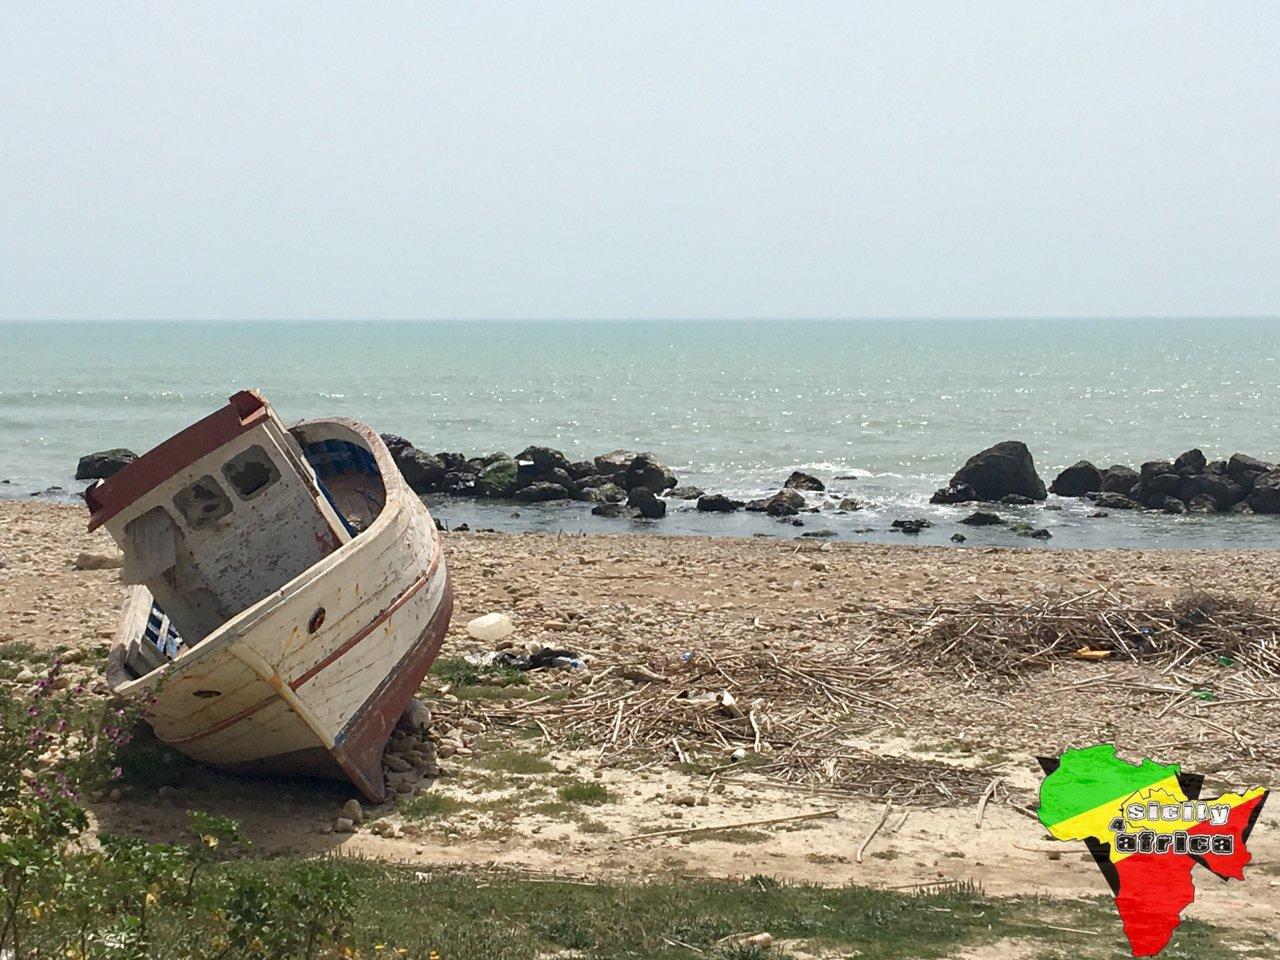 Sicily4Africa-3th-edition-Marina di Palma